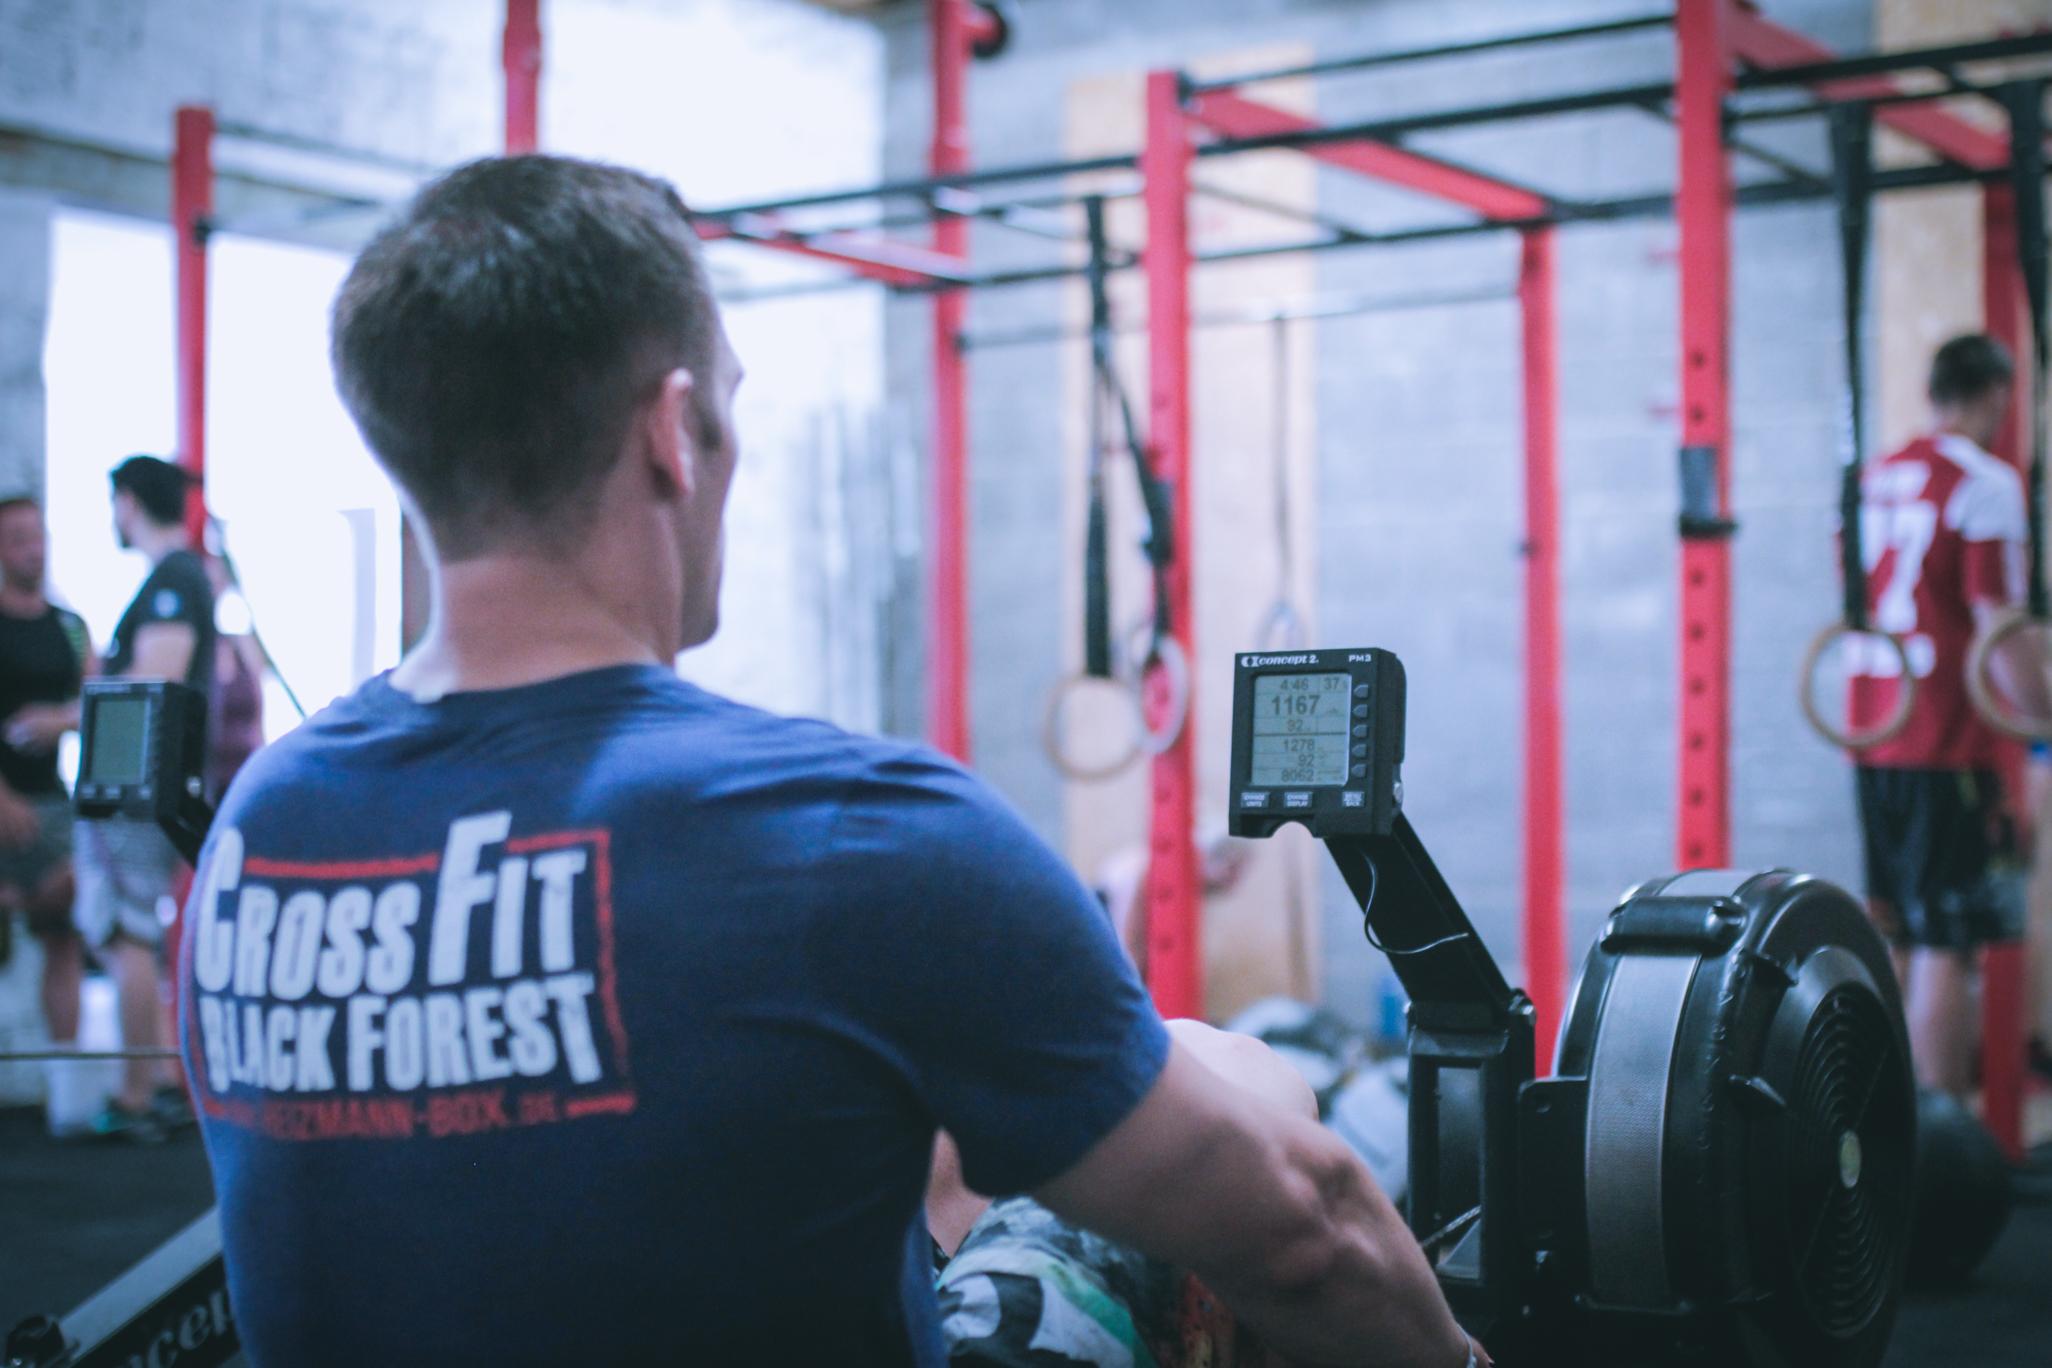 CrossFit Freiburg Black Forest Team 11